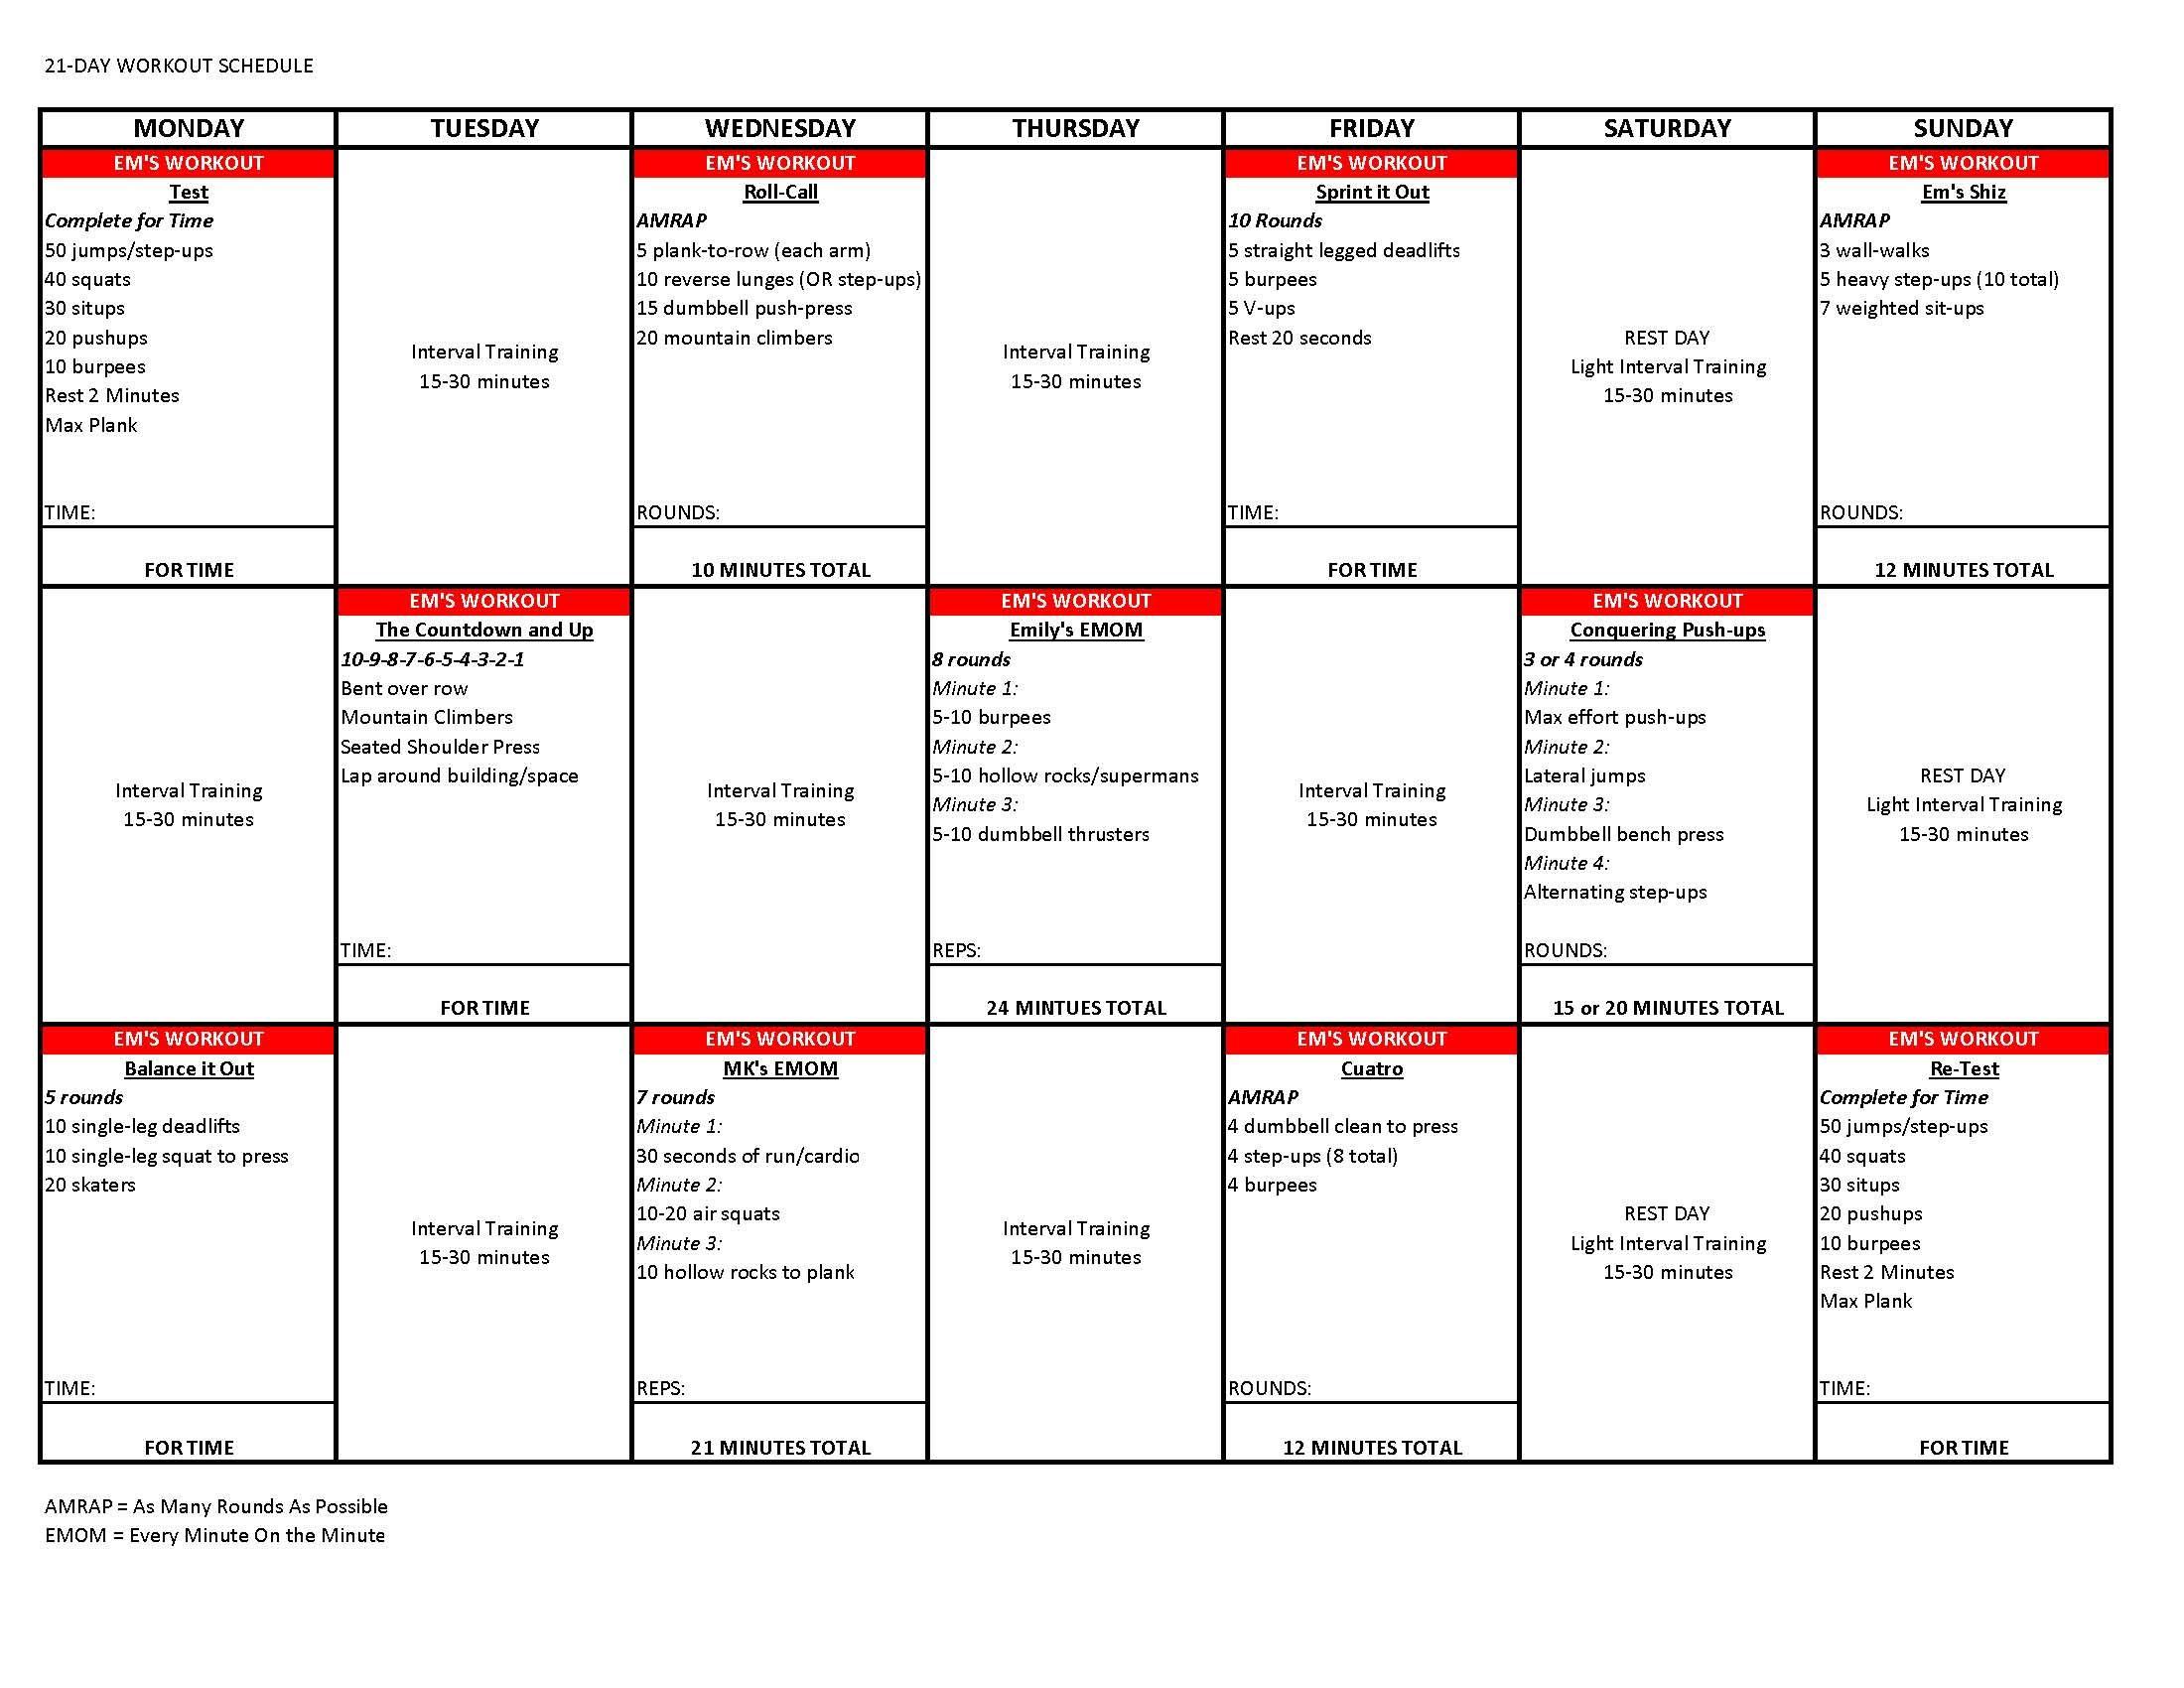 This Is The Training Schedule From Most Recent 5 4 24 Superhero Challenge By Emily Schromm 21daysuperherochallenge Beyourownsuperhero